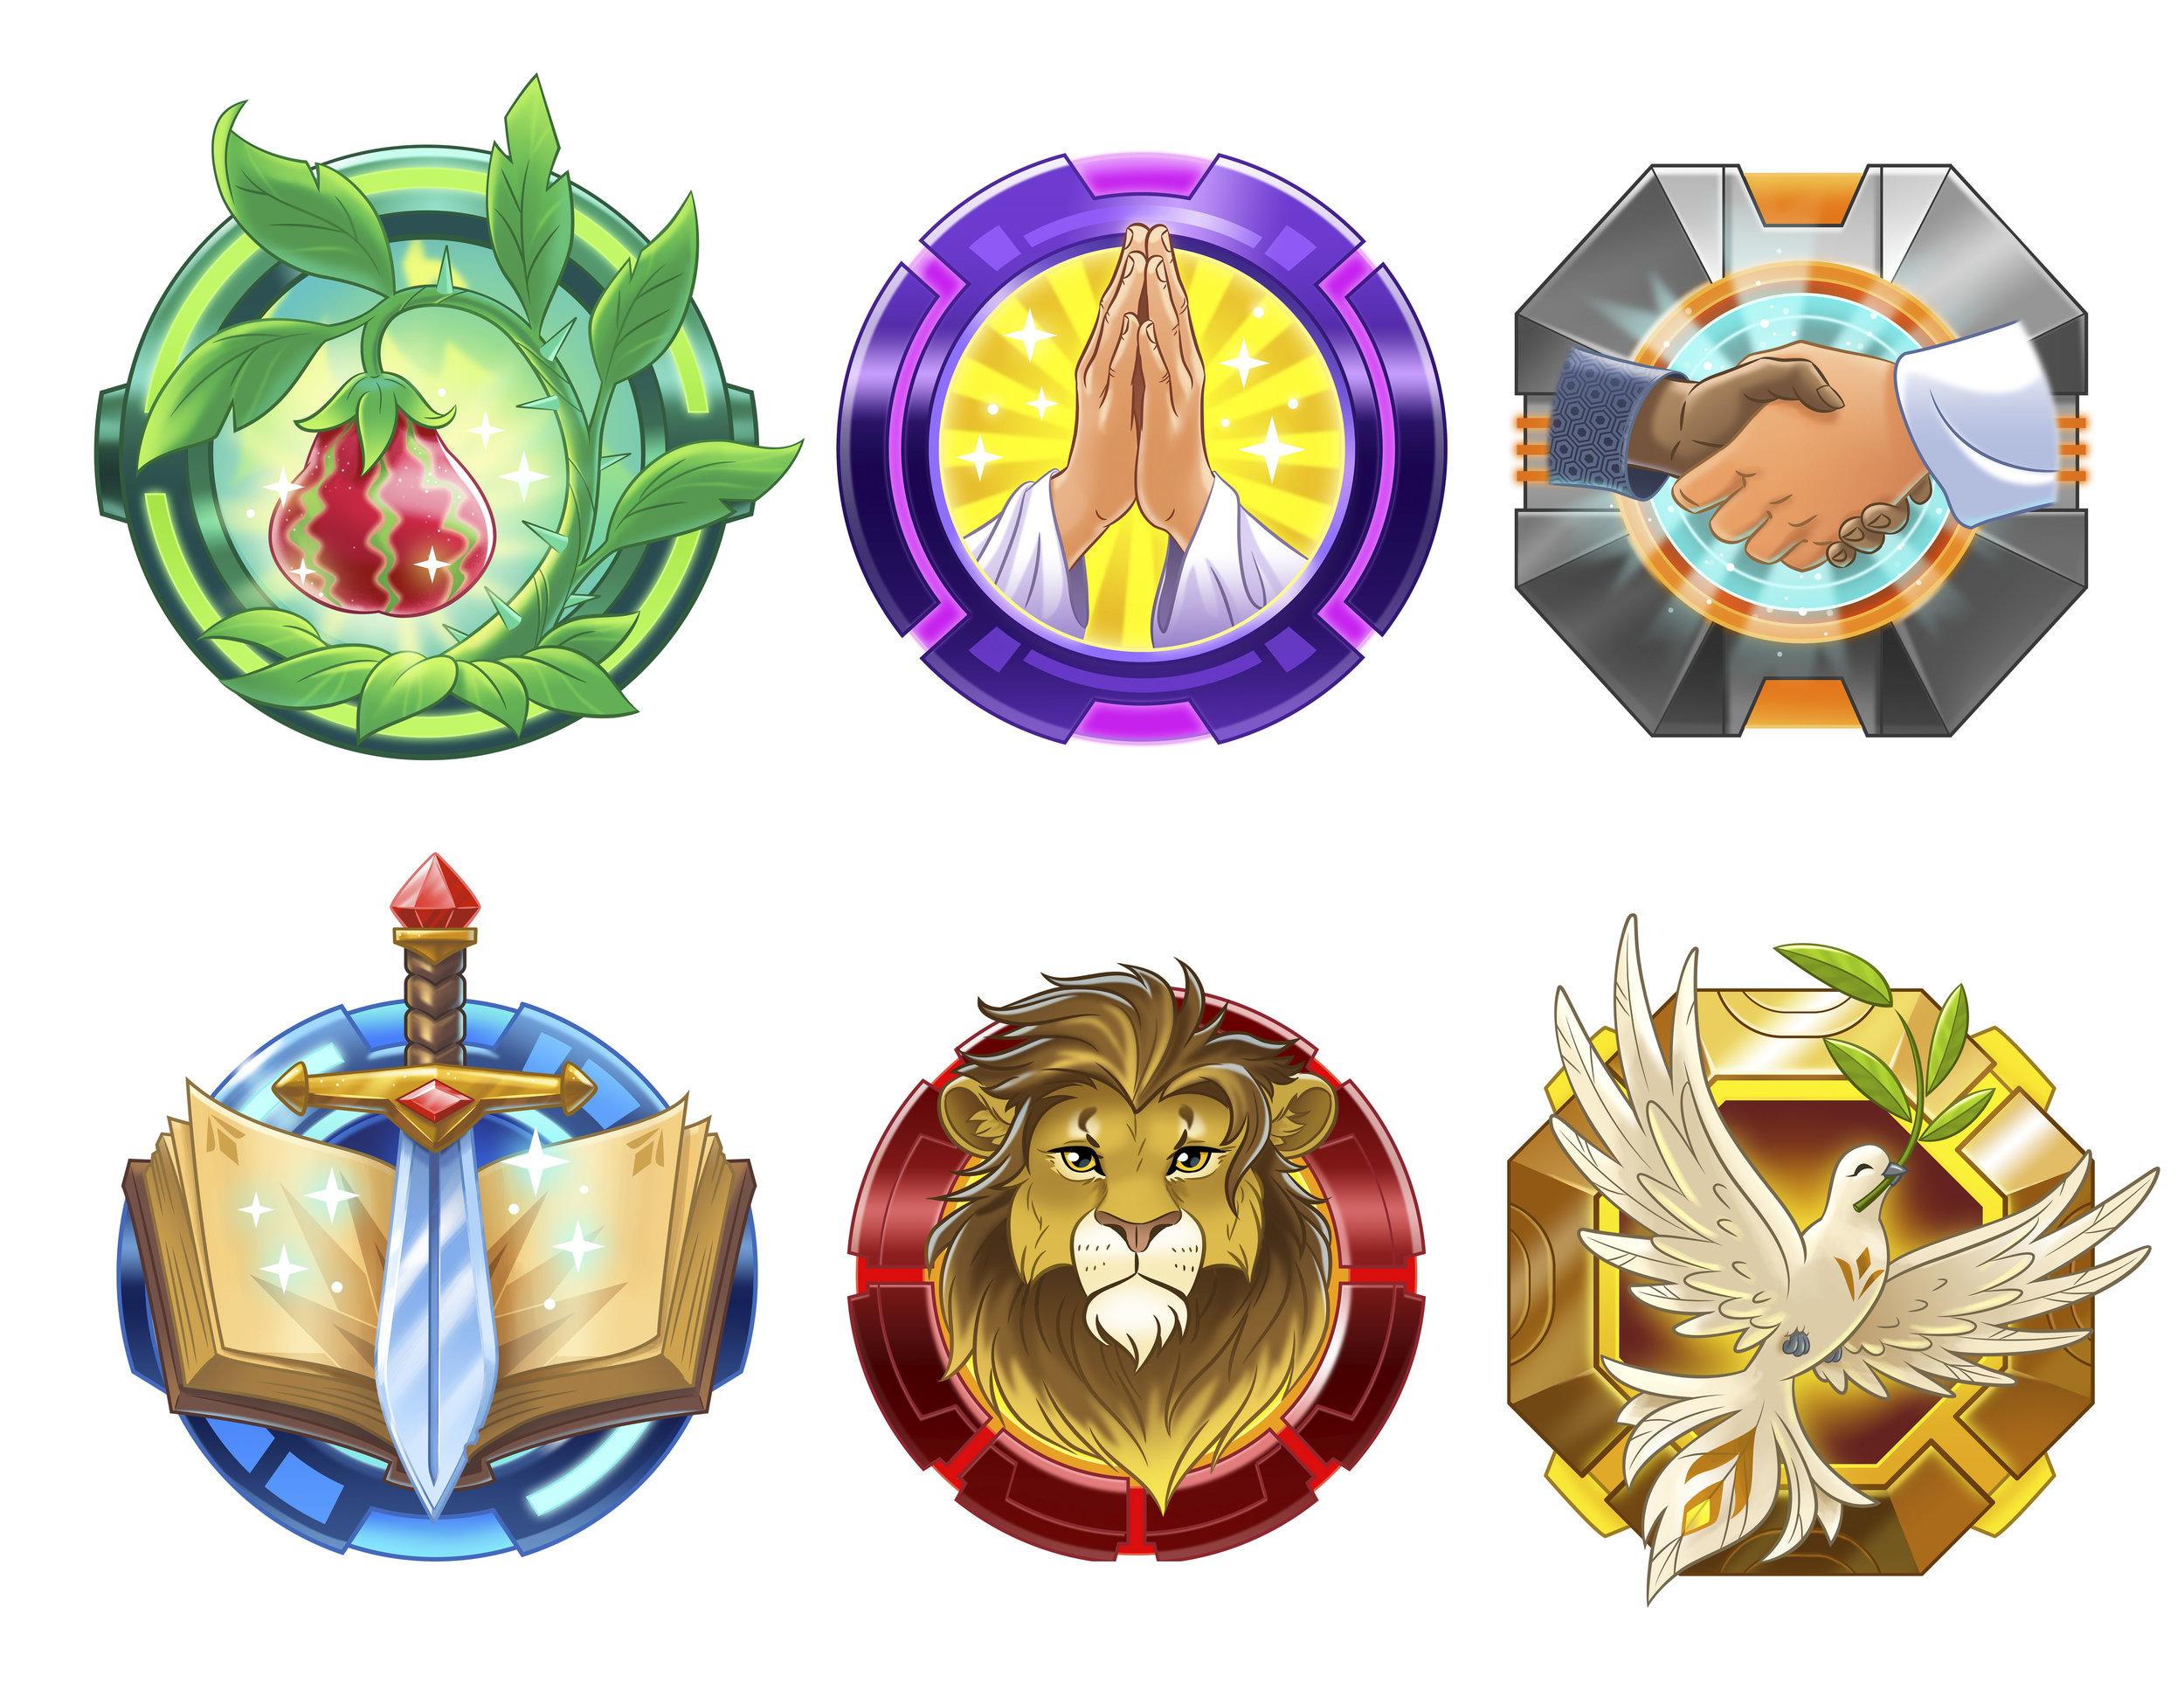 Reward badges - Art Direction (Illustration by Kelly Grupczynski Illustration)